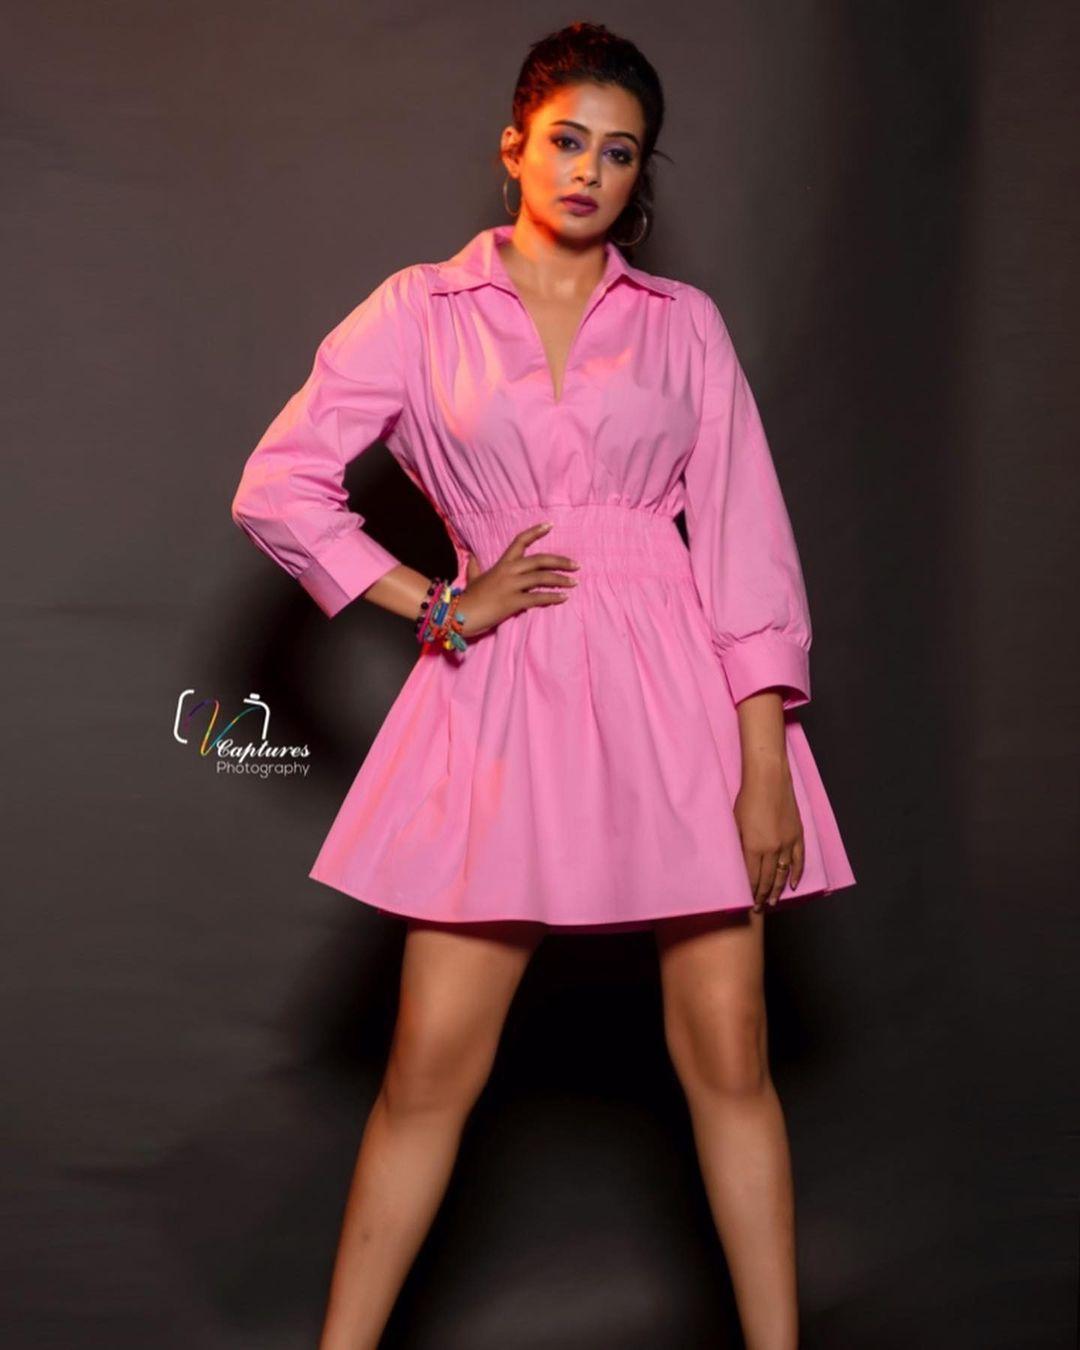 Beautiful actress Priyamani in pink color zara knee length dress. Dress : Zara. Styling: Mehek Shetty. 2021-10-13